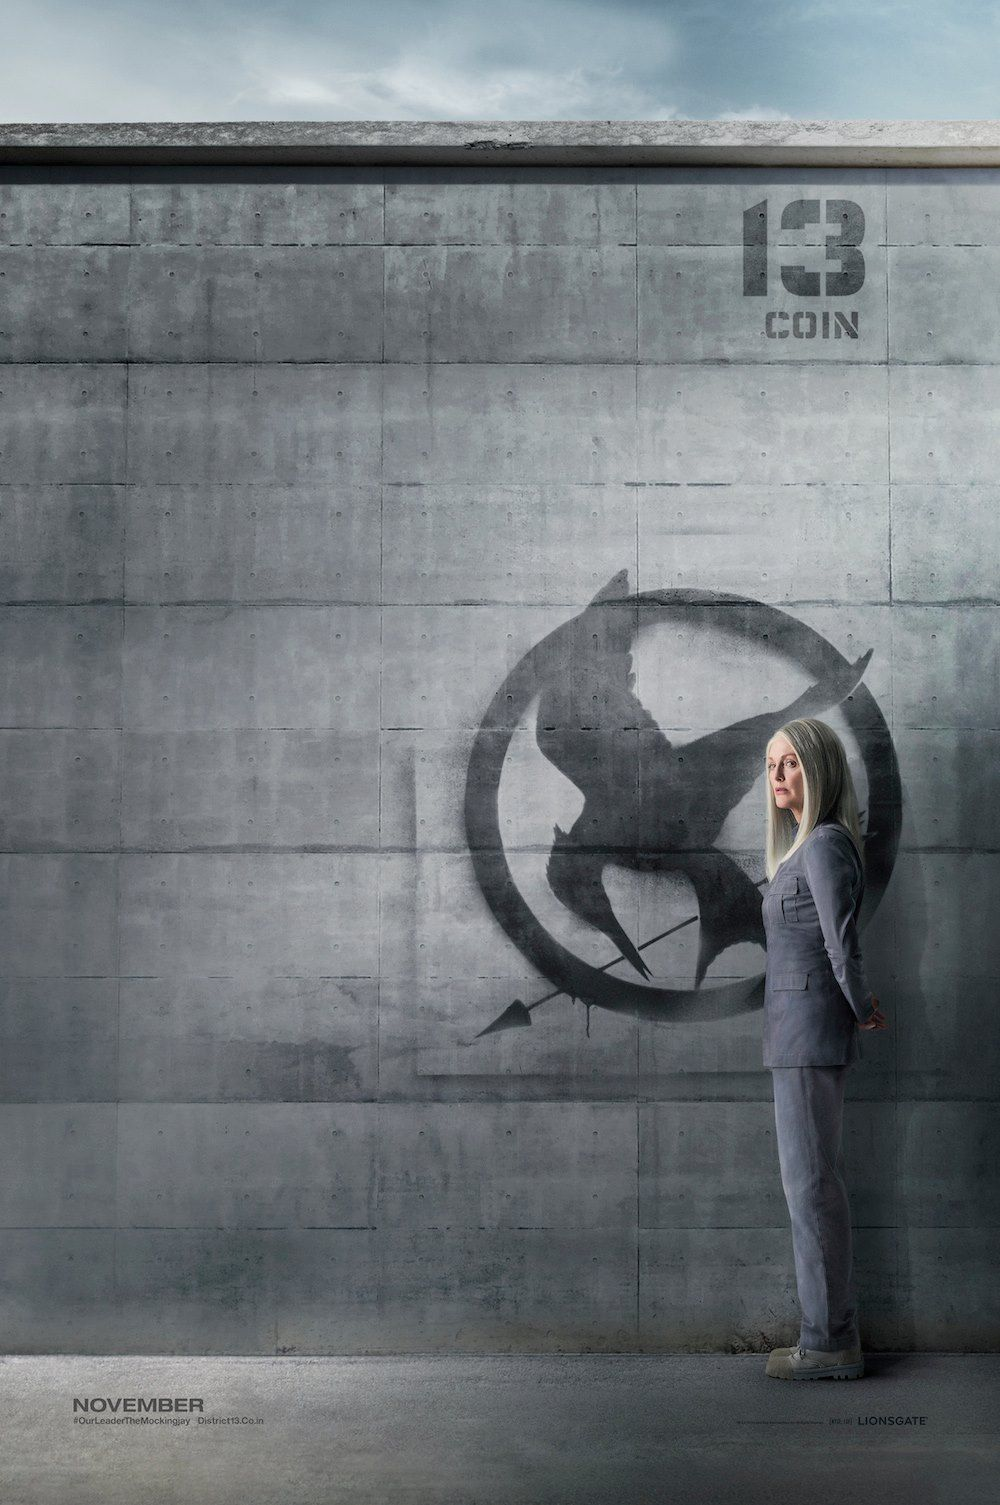 #TheHungerGames: #Mockingjay Part 1 (2014) District 13 Portraits #film